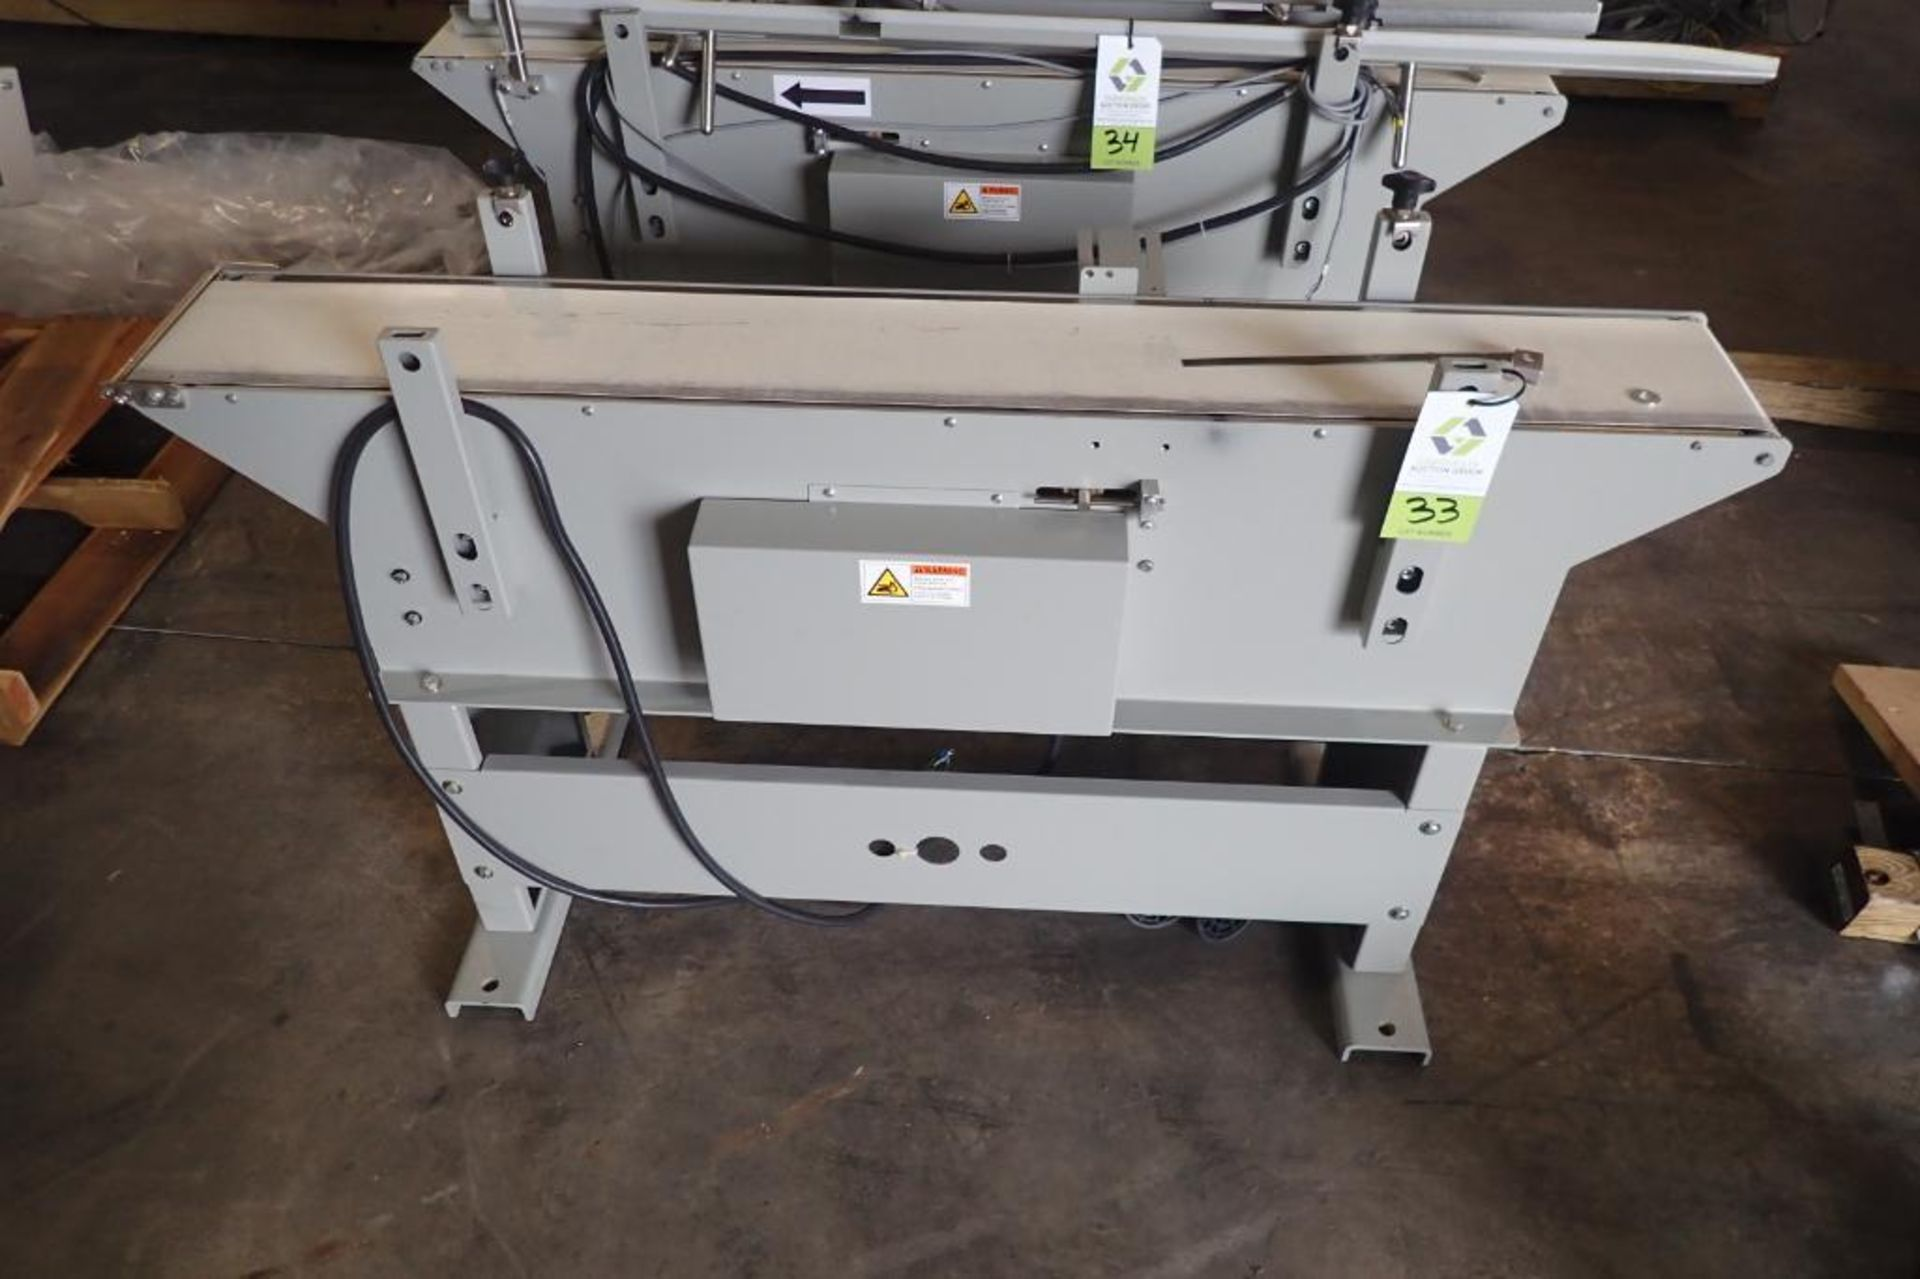 Lot 33 - Stork Texwrap transfer conveyor, Model STE-SA438, SN SA0213, white vinyl belt, 60 in. long x 7.5 in.